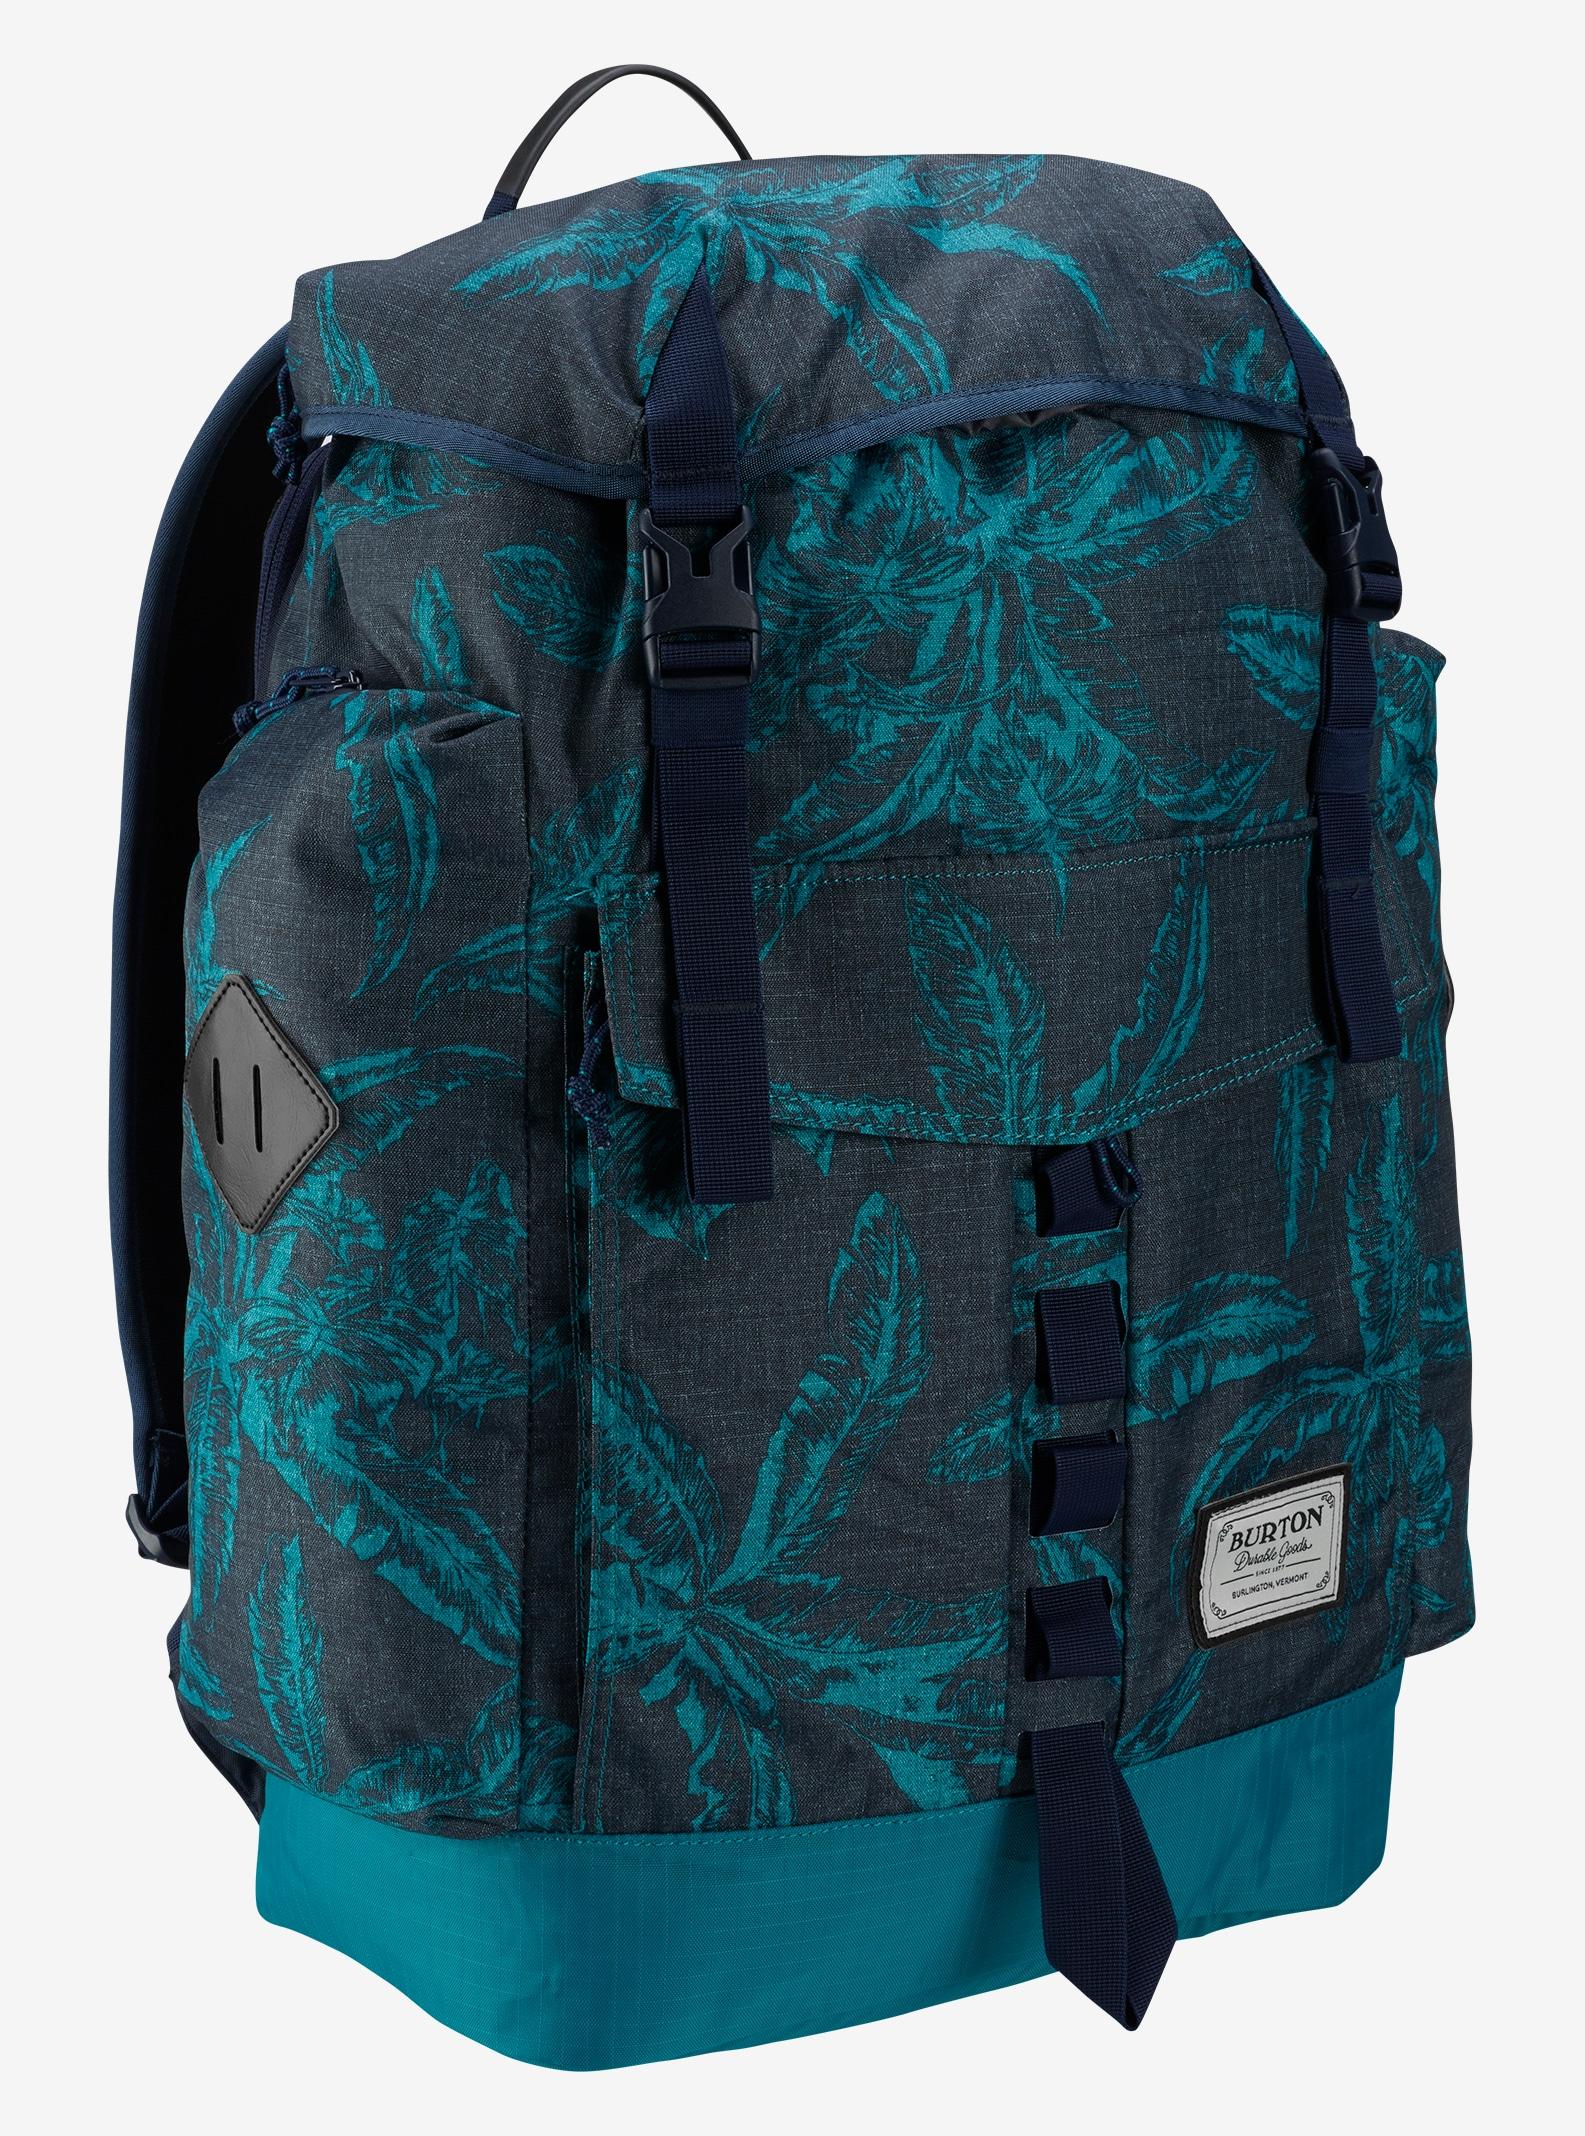 Burton Fathom Backpack shown in Tropical Print